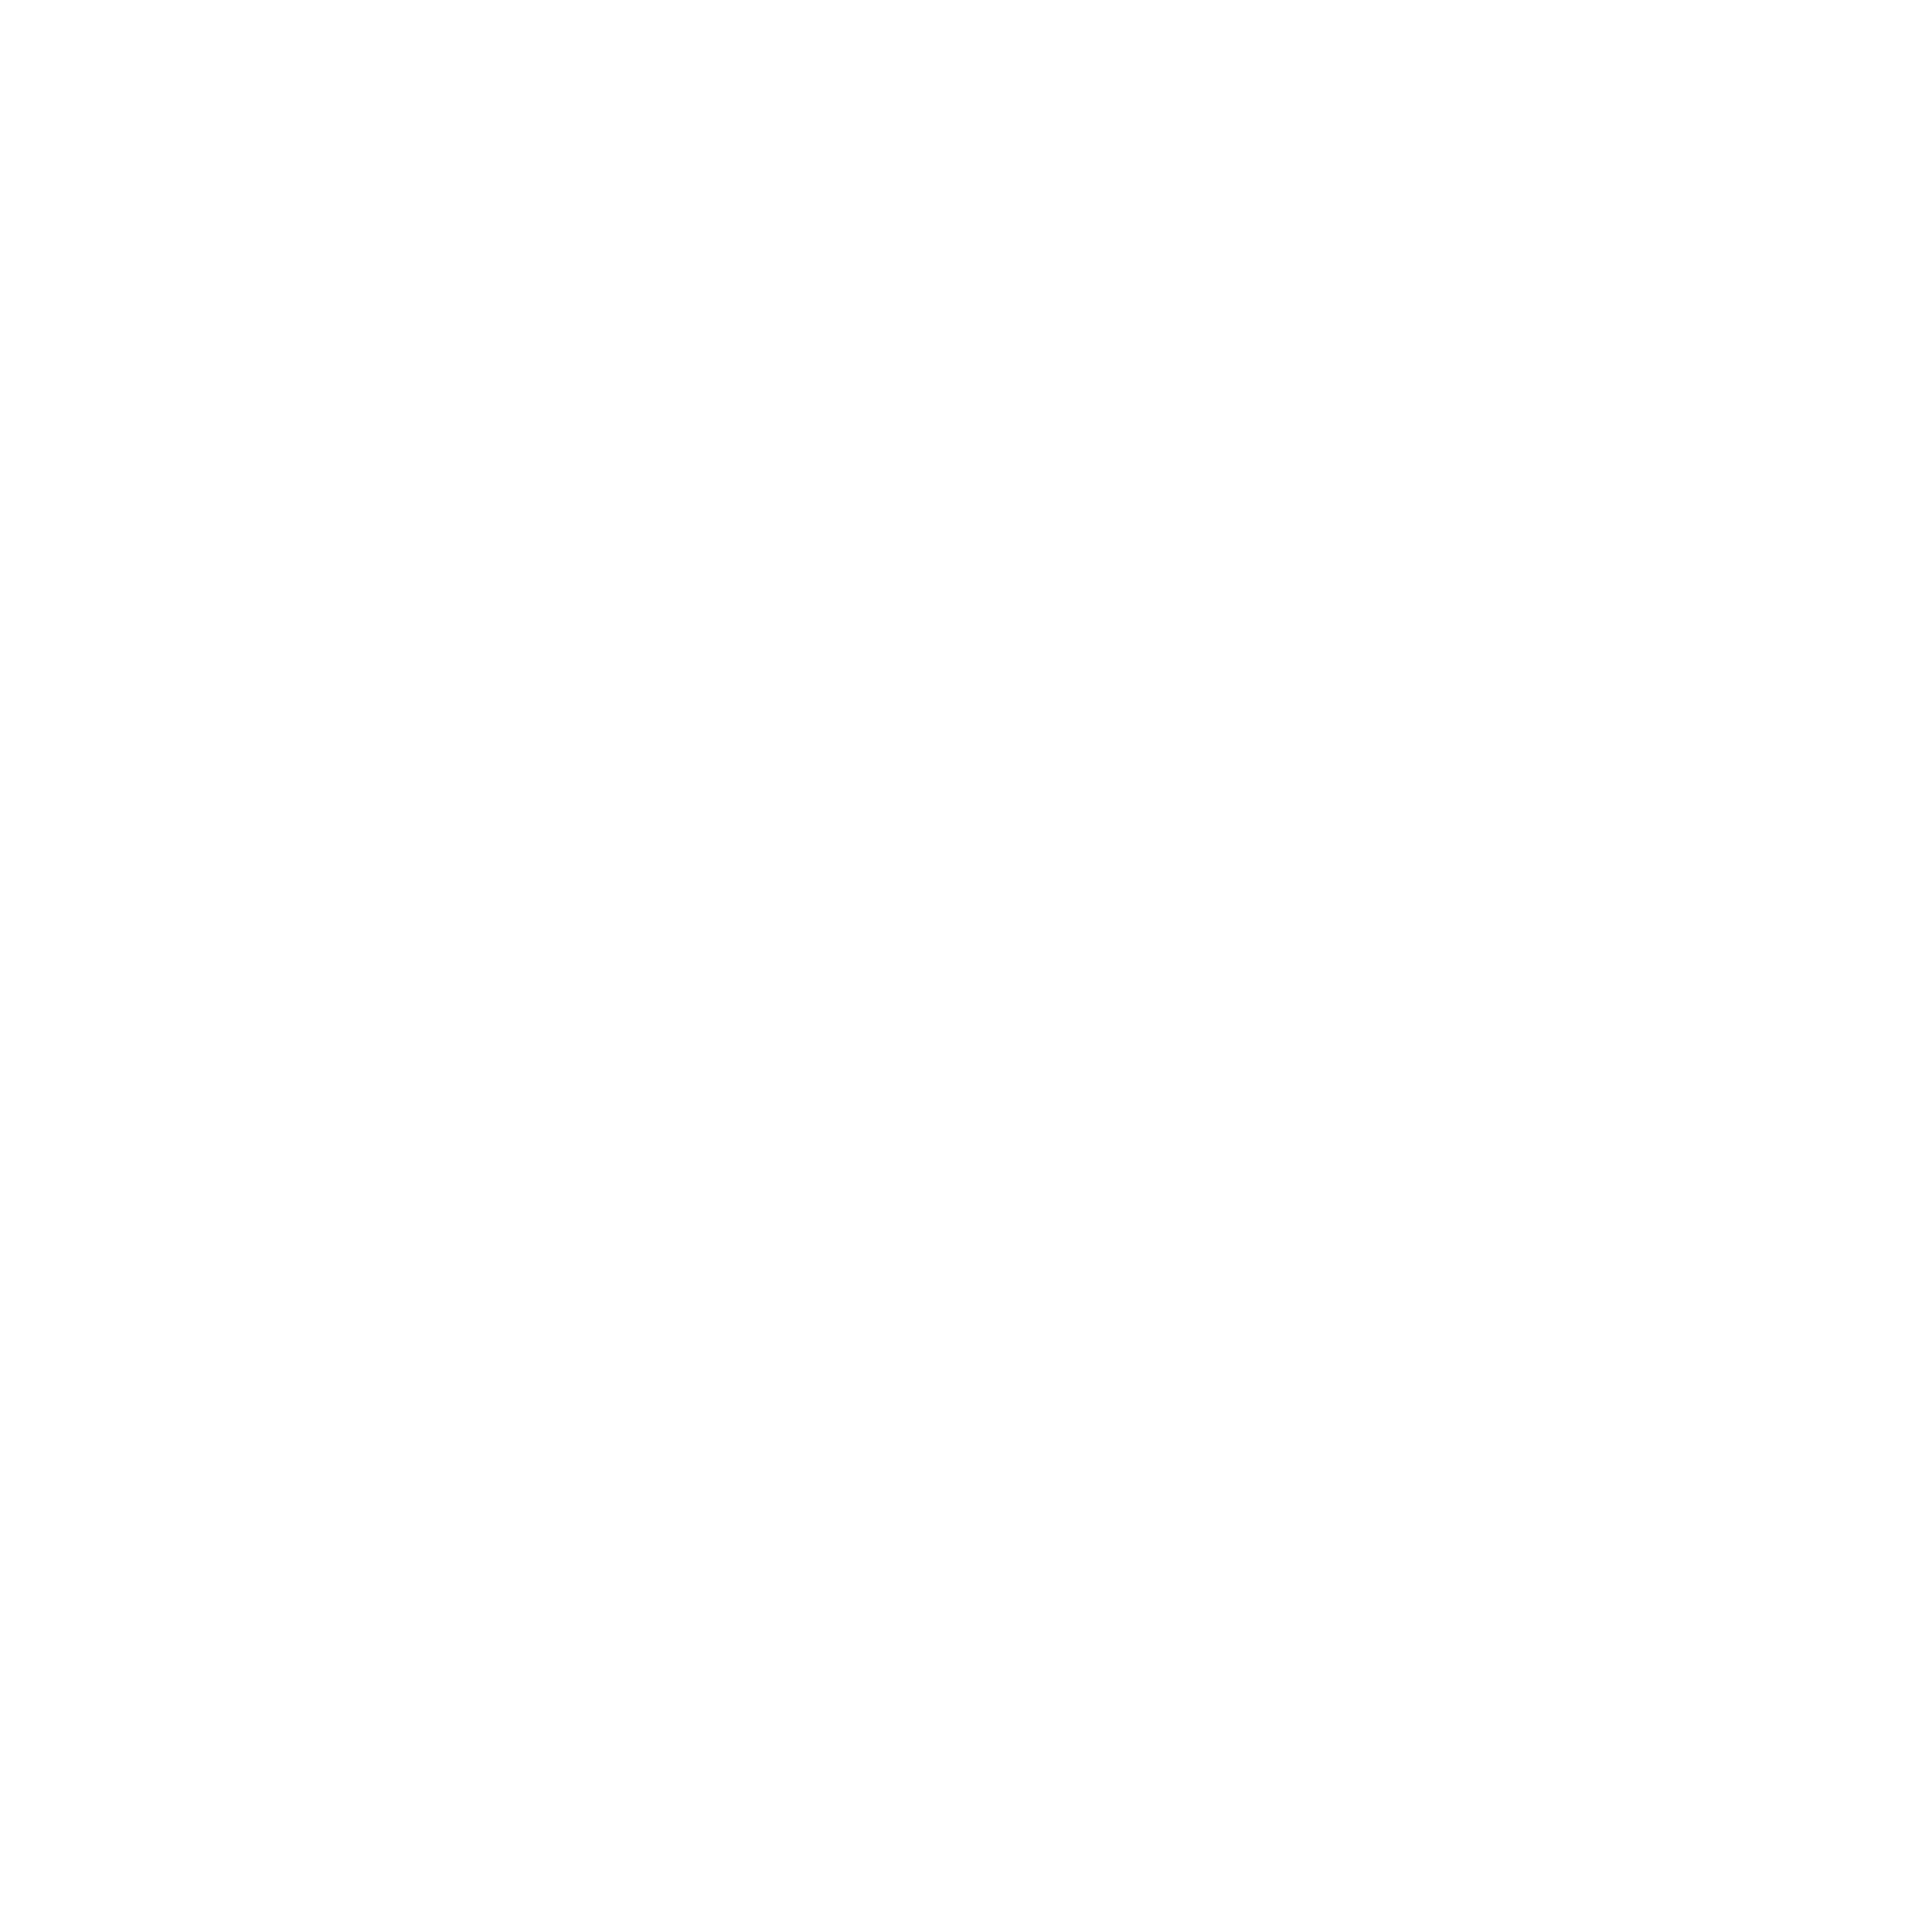 Zina Spezakis